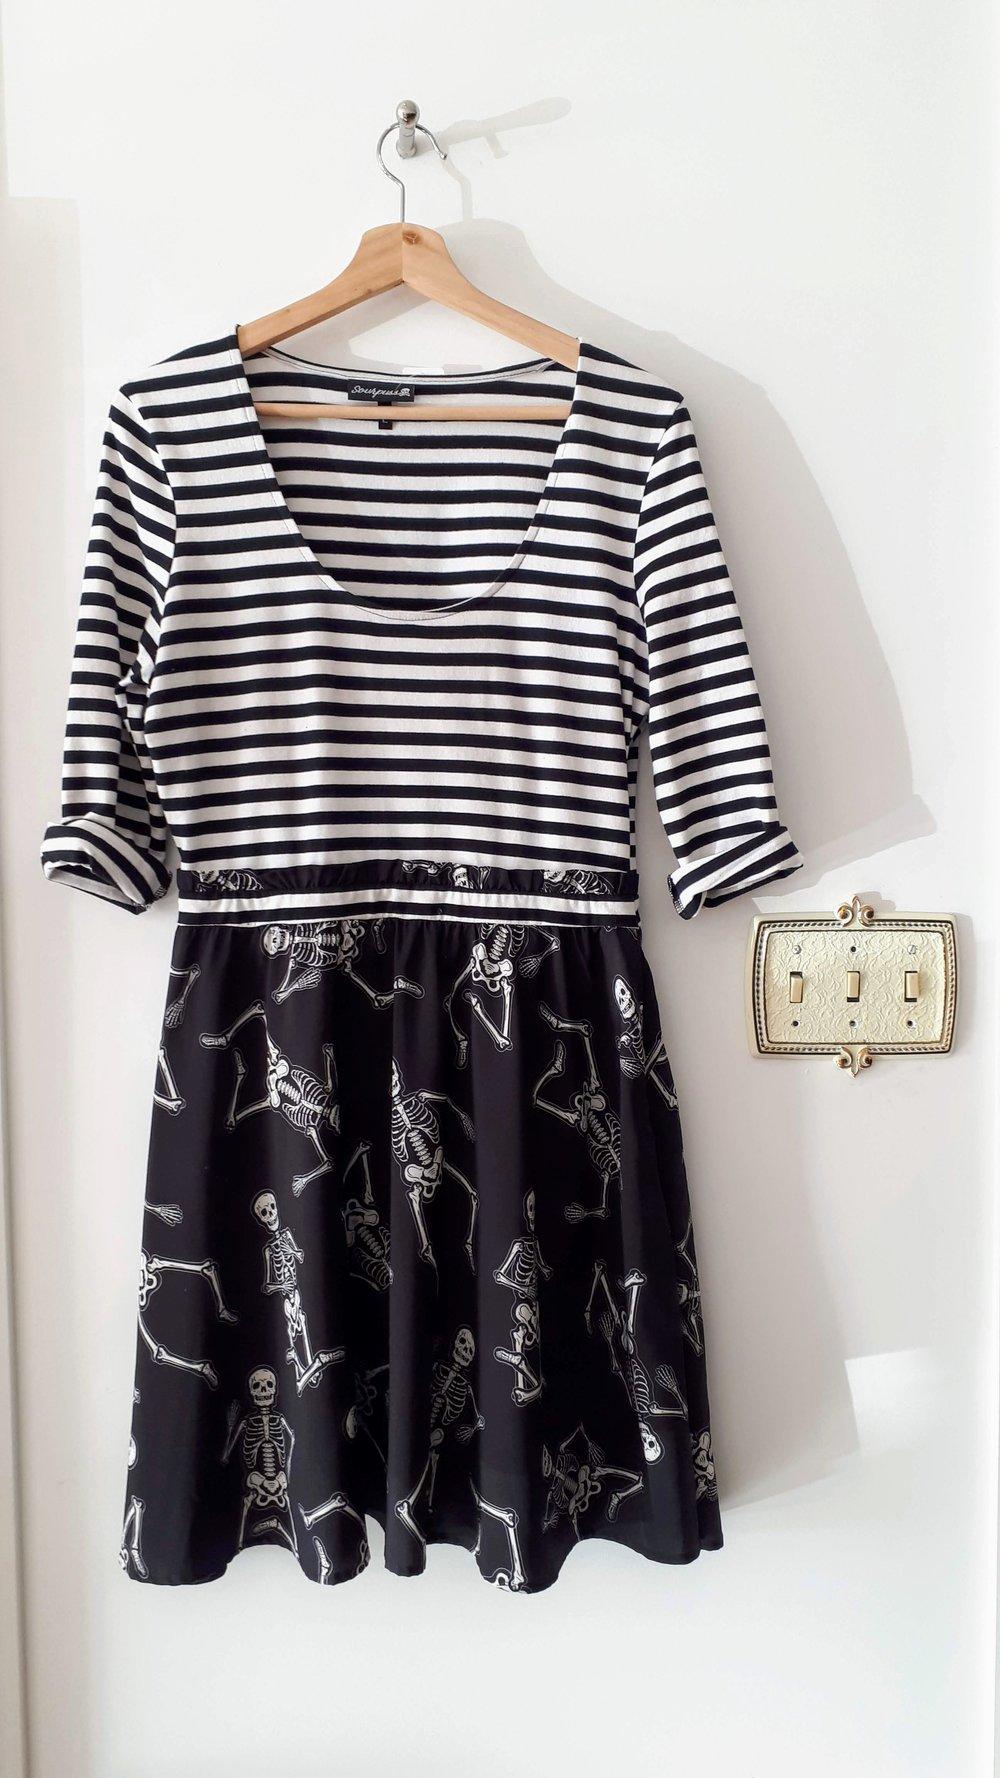 Sourpuss dress; Size L, $42 (on sale for $21!)